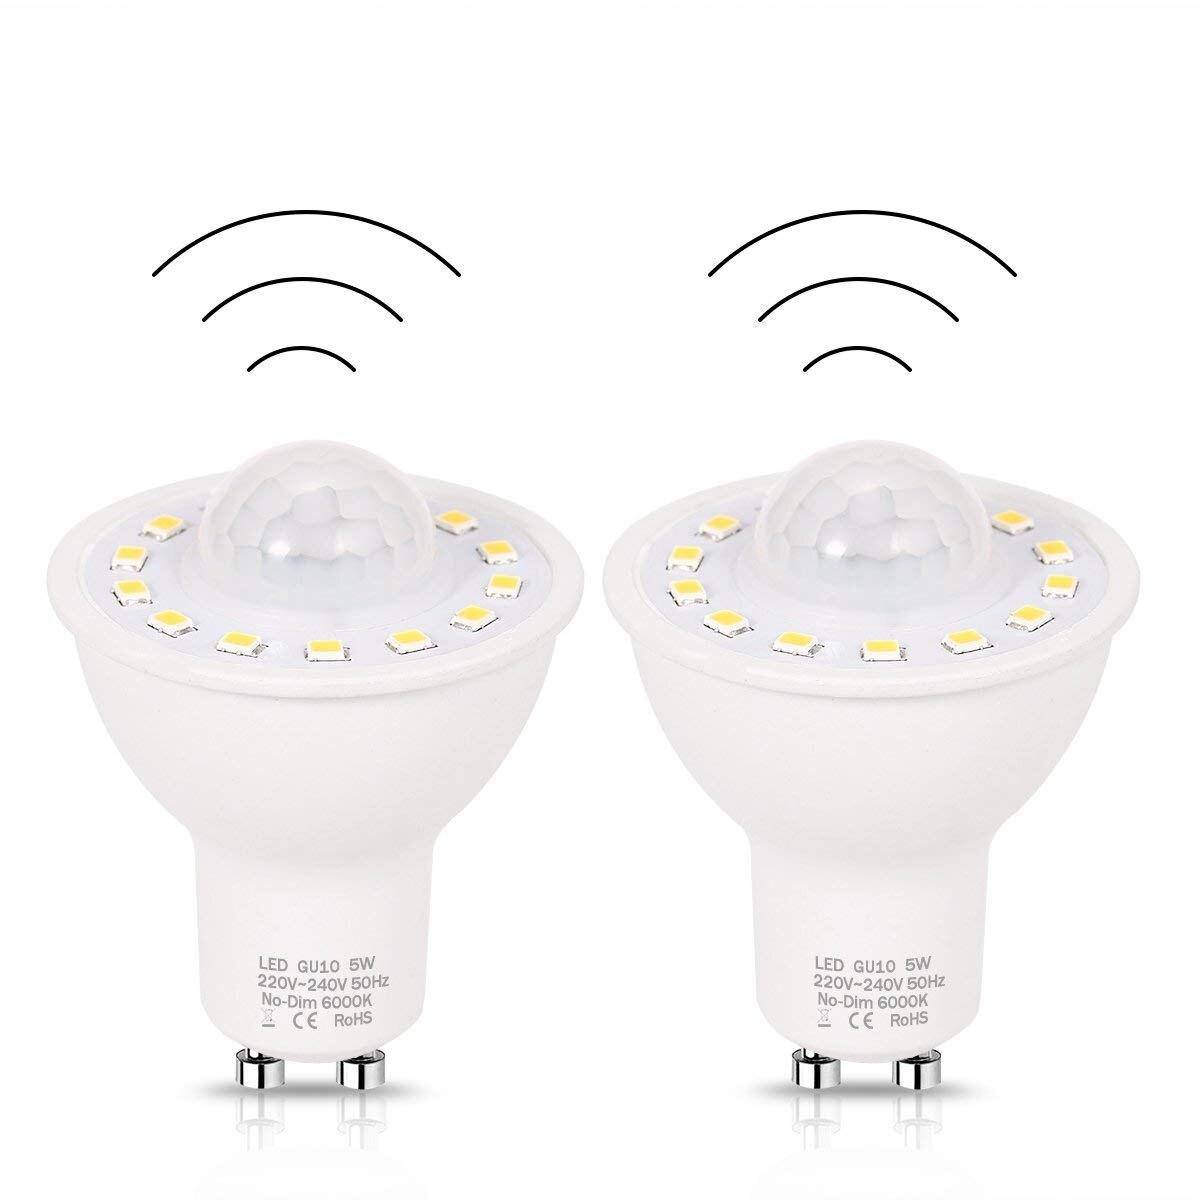 GU10 PIR Motion Sensor LED Glühbirnen 5 watt, 50 watt Äquivalent 500lm Tag Weiß 6000 karat für Treppen Garage Korridor Gehweg Hallway-2Pack